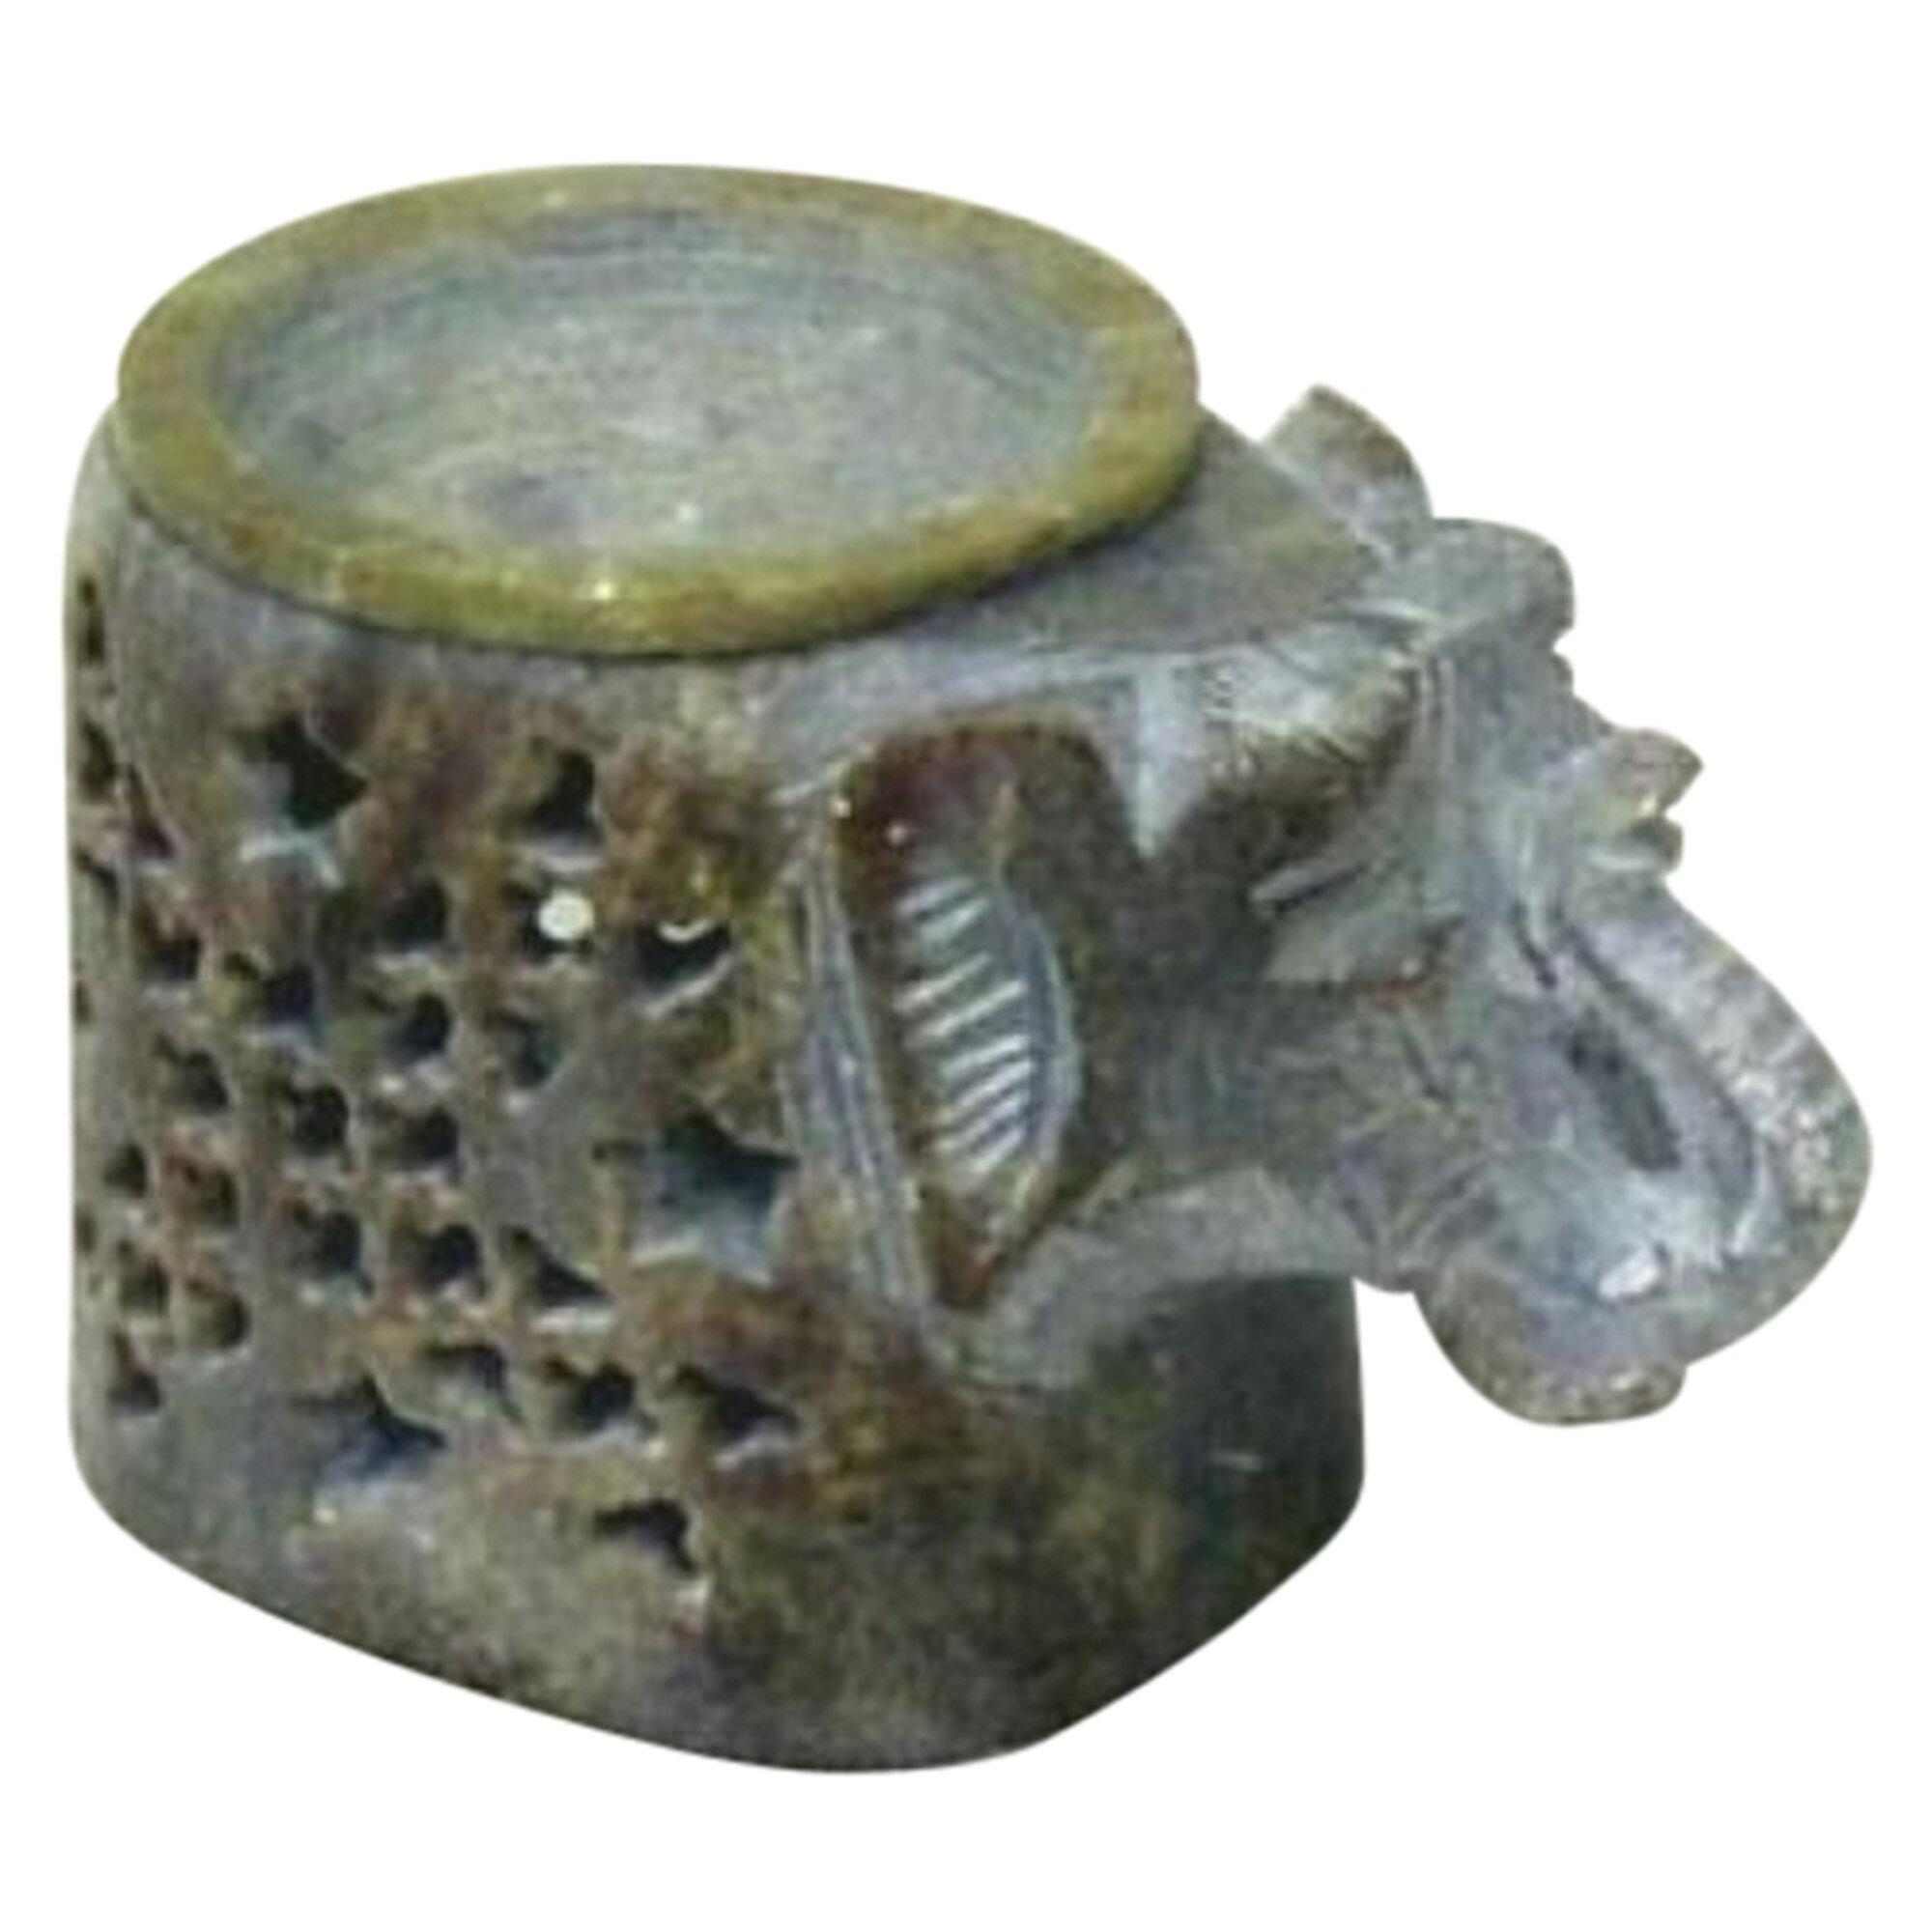 World Menagerie Soapstone Elephant Aroma Small Stone Tealight Holder Wayfair